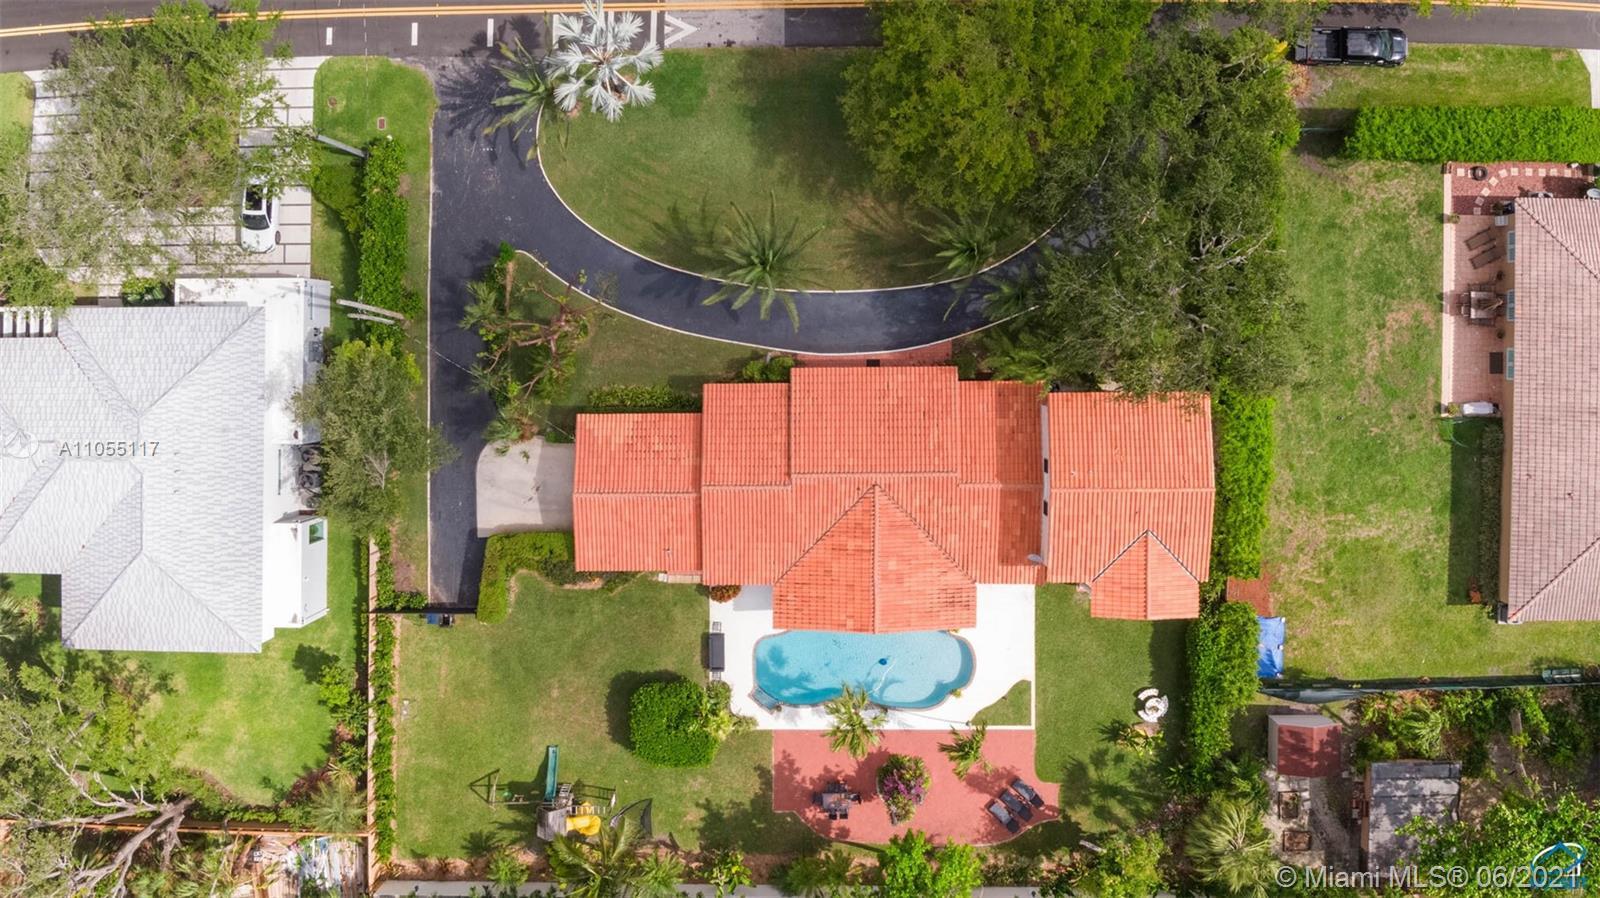 Palm Miami Heights - 5940 SW 79 St, South Miami, FL 33143